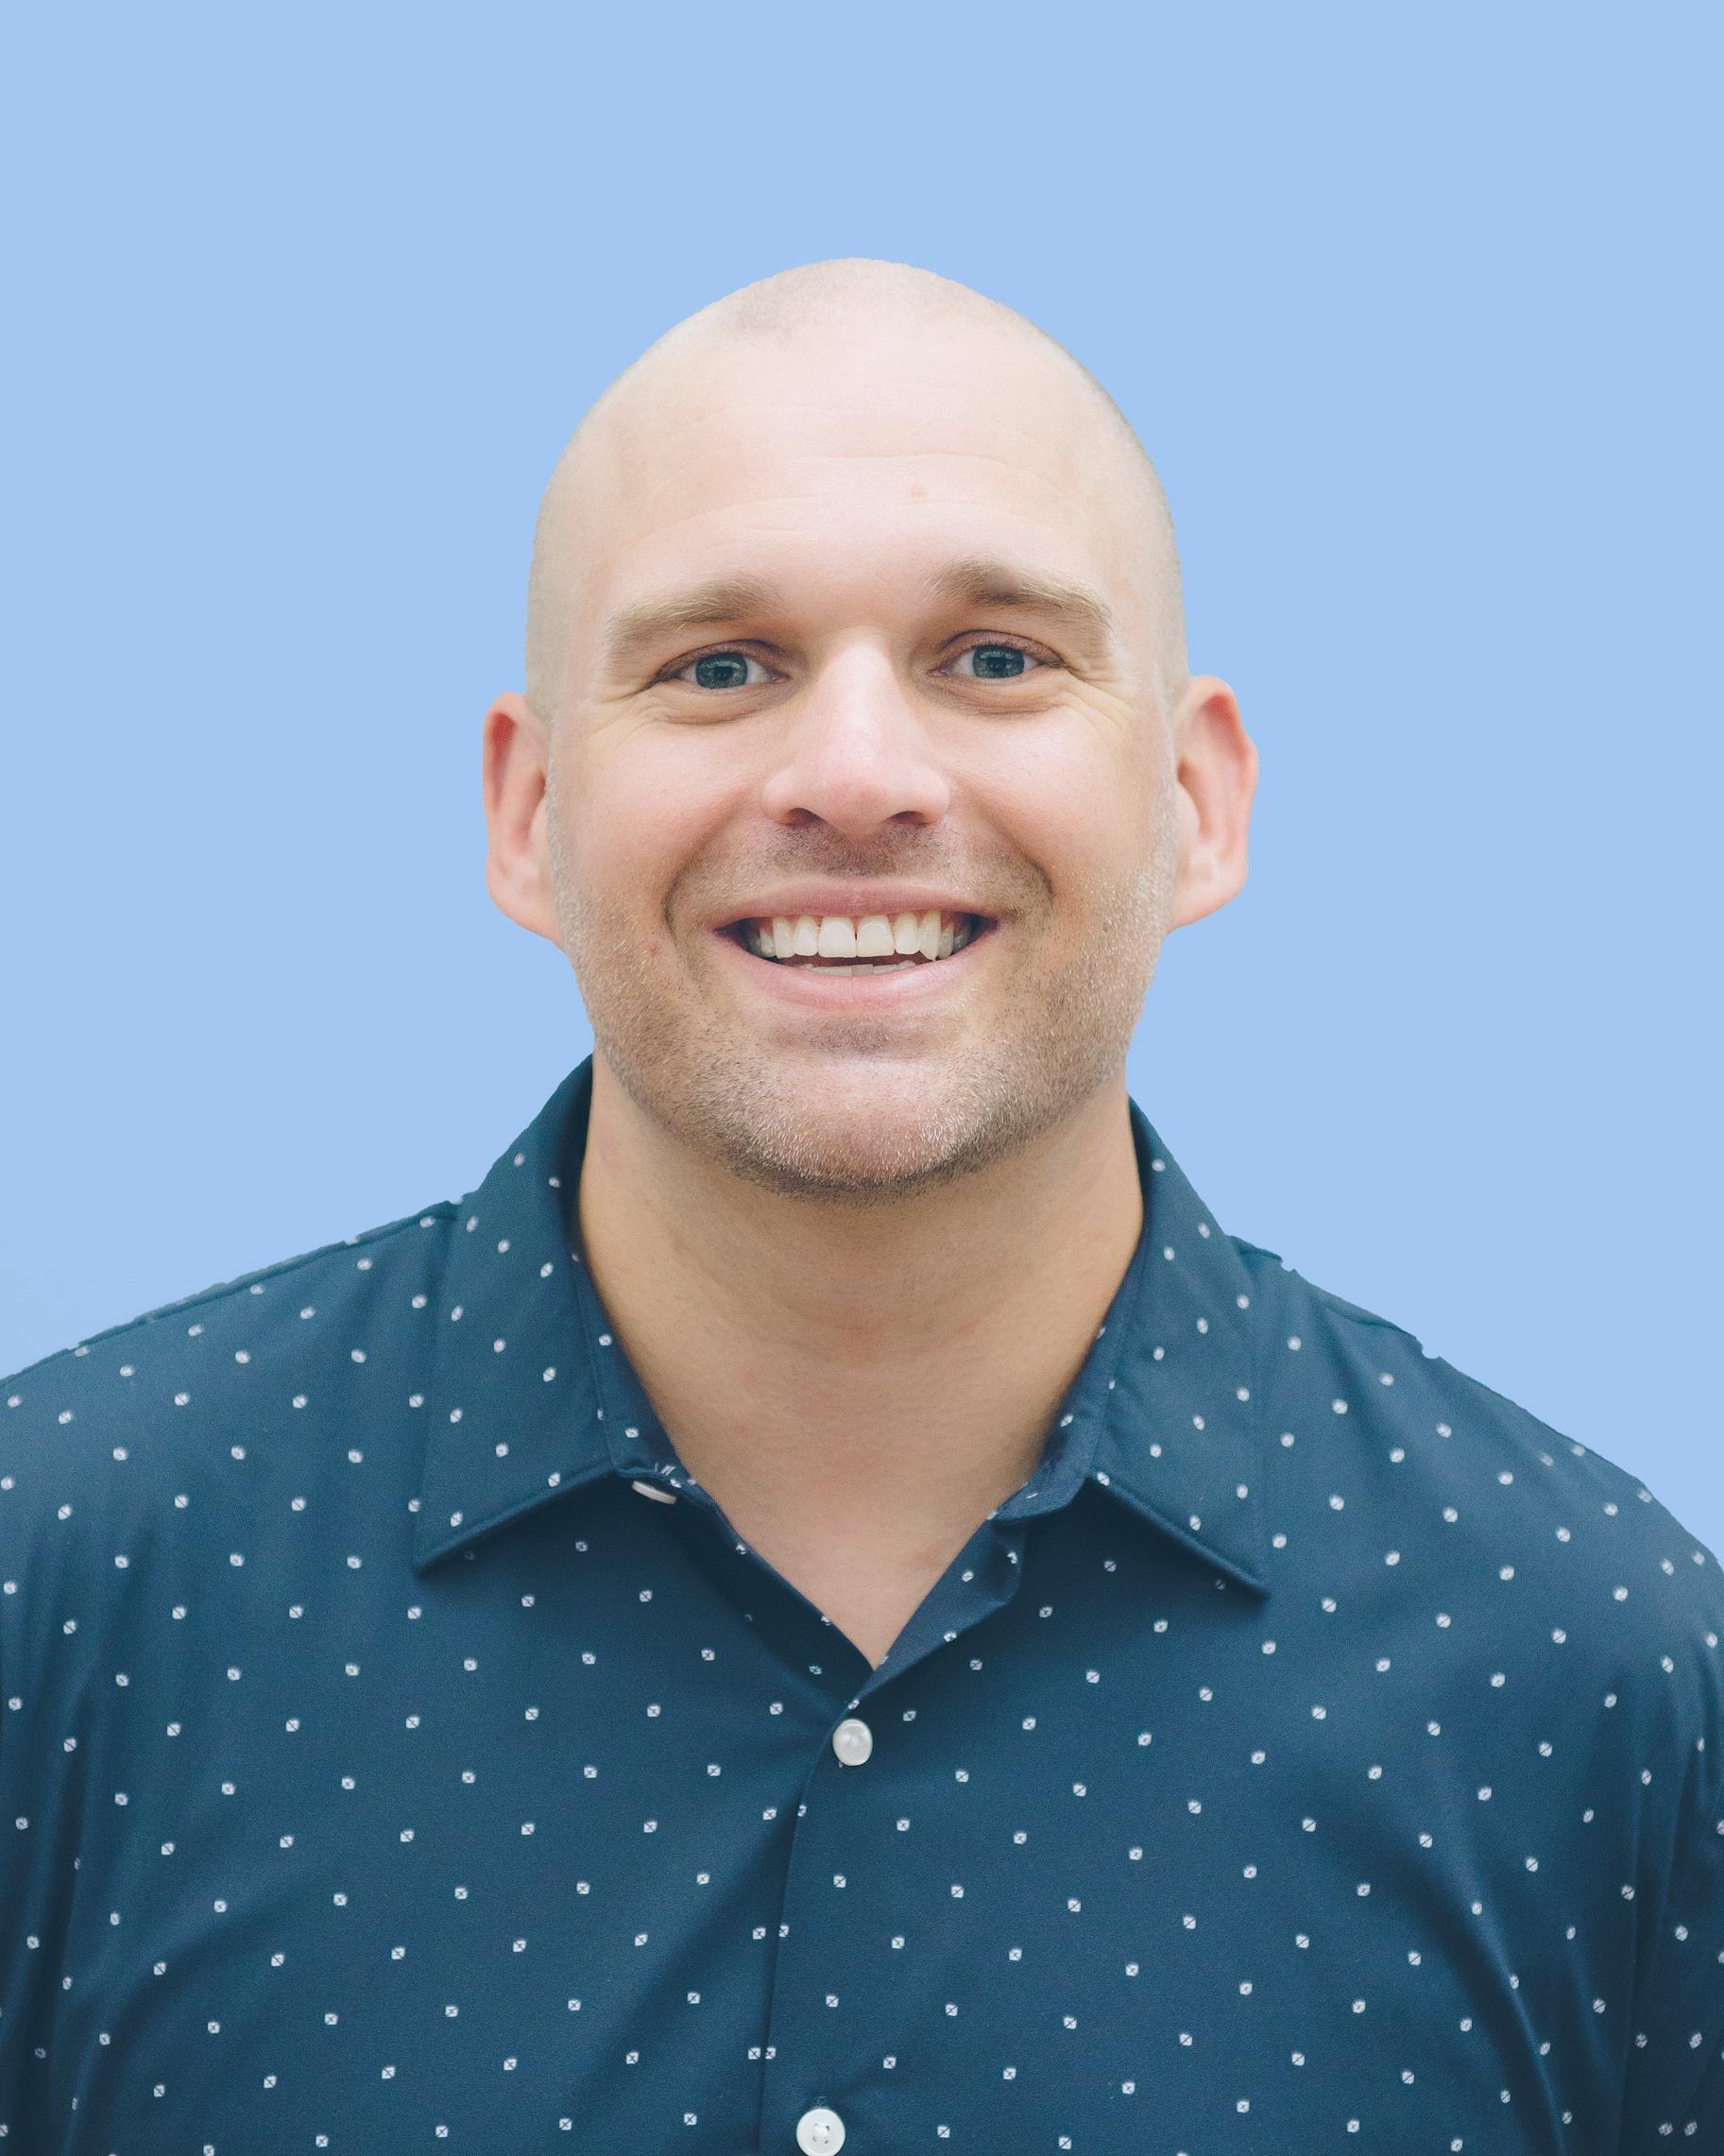 Casey Harlin, Founder of Rinse